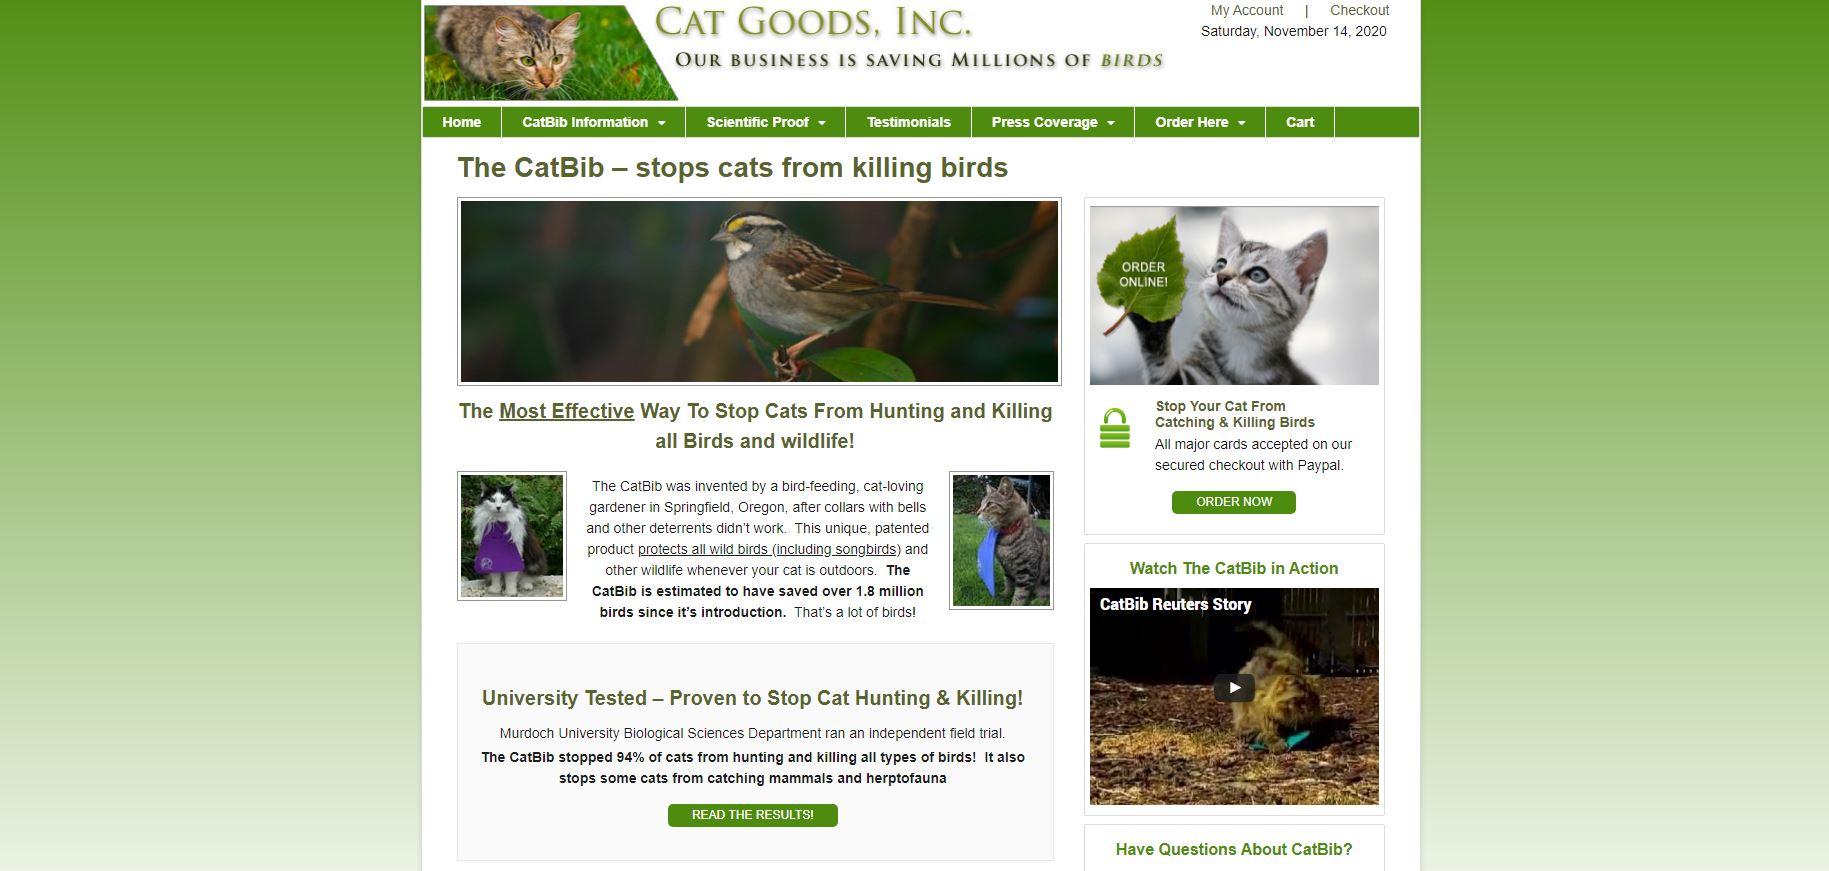 catgoods